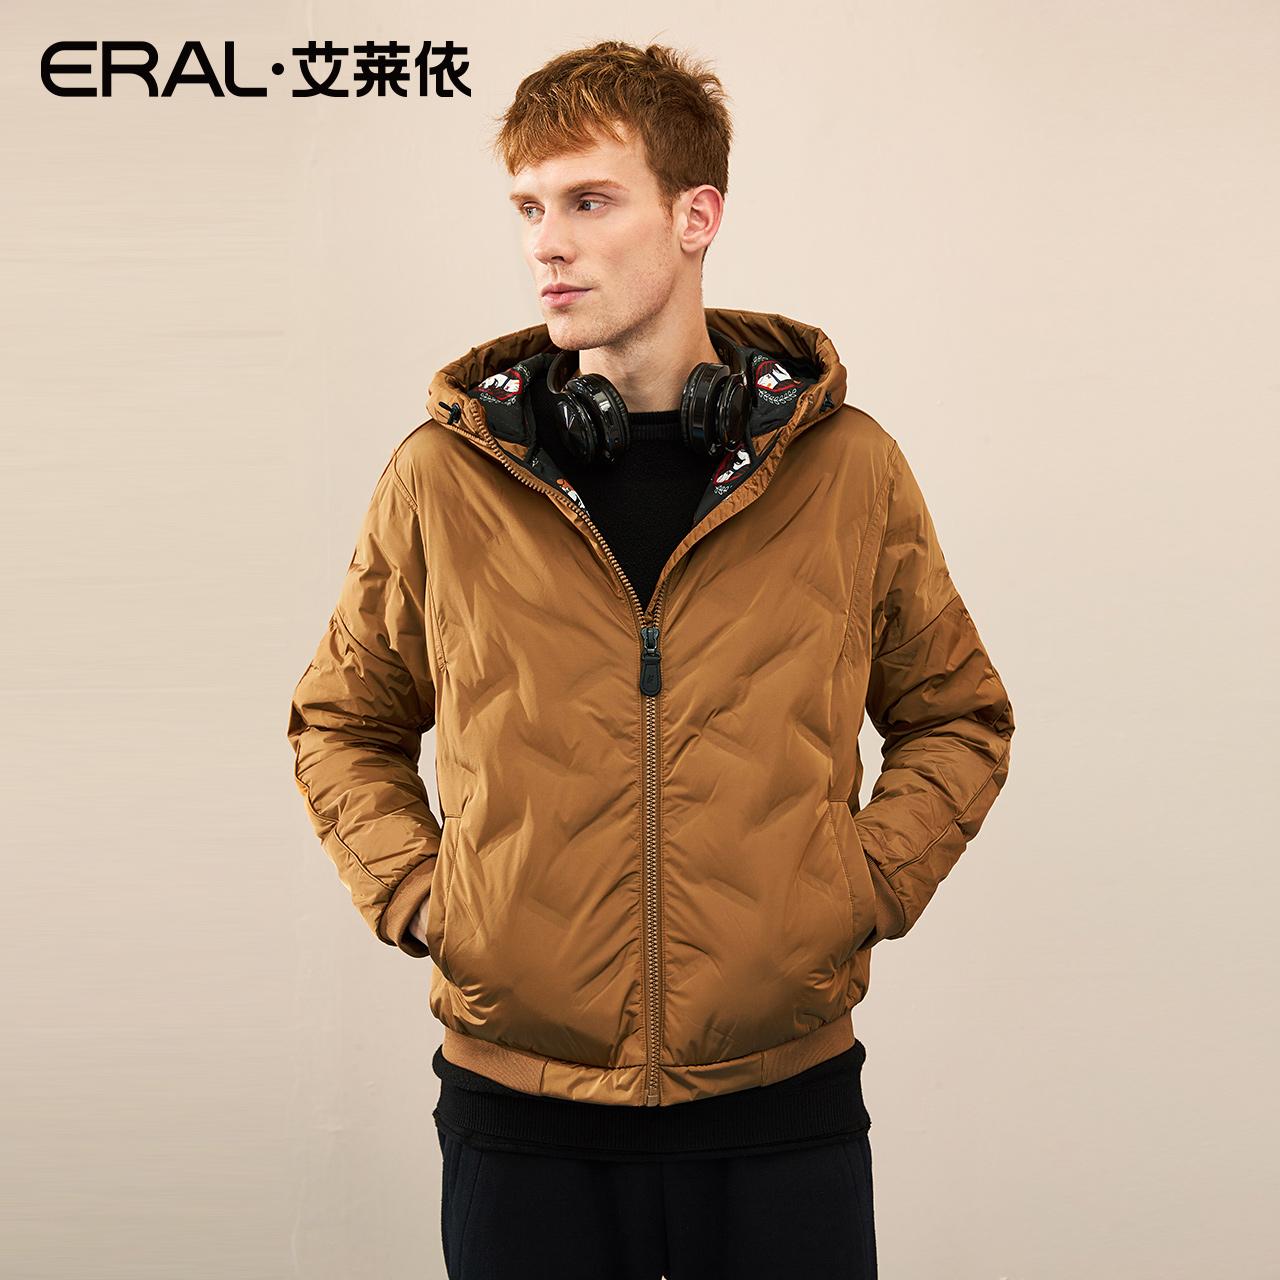 ERAL/艾莱依2018秋冬新款羽绒服男短款修身轻便男外套19057/FDAC